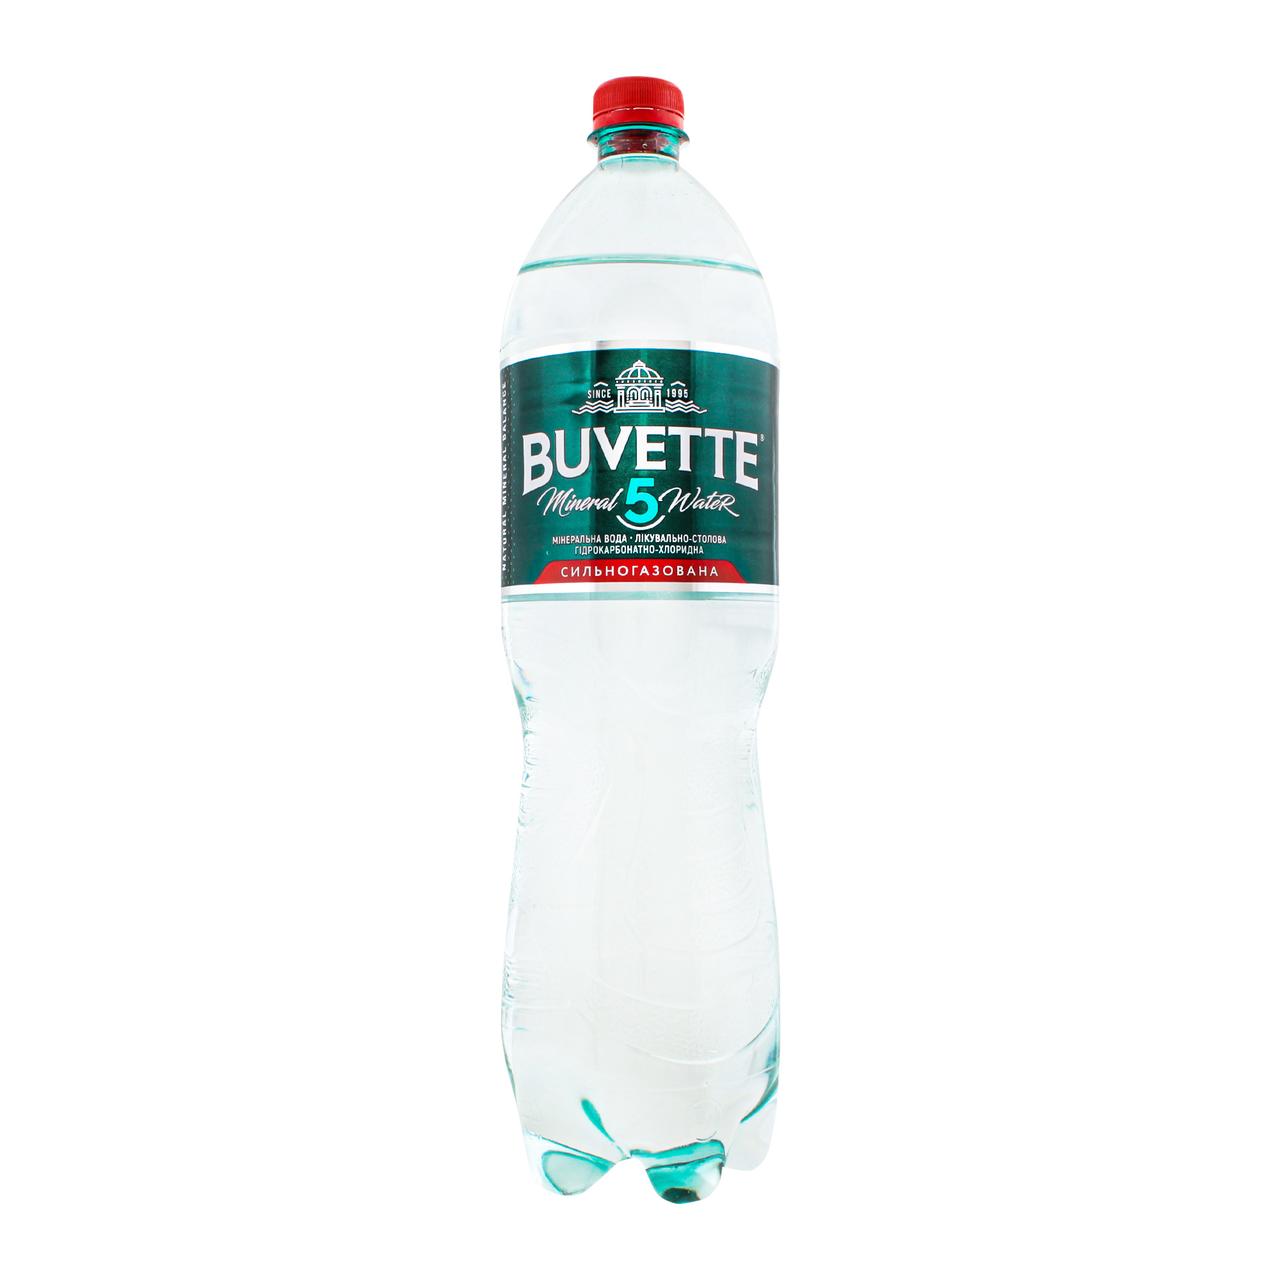 Вода мінеральна Buvette 5 сильногазов лікувальн-столова 1.5л